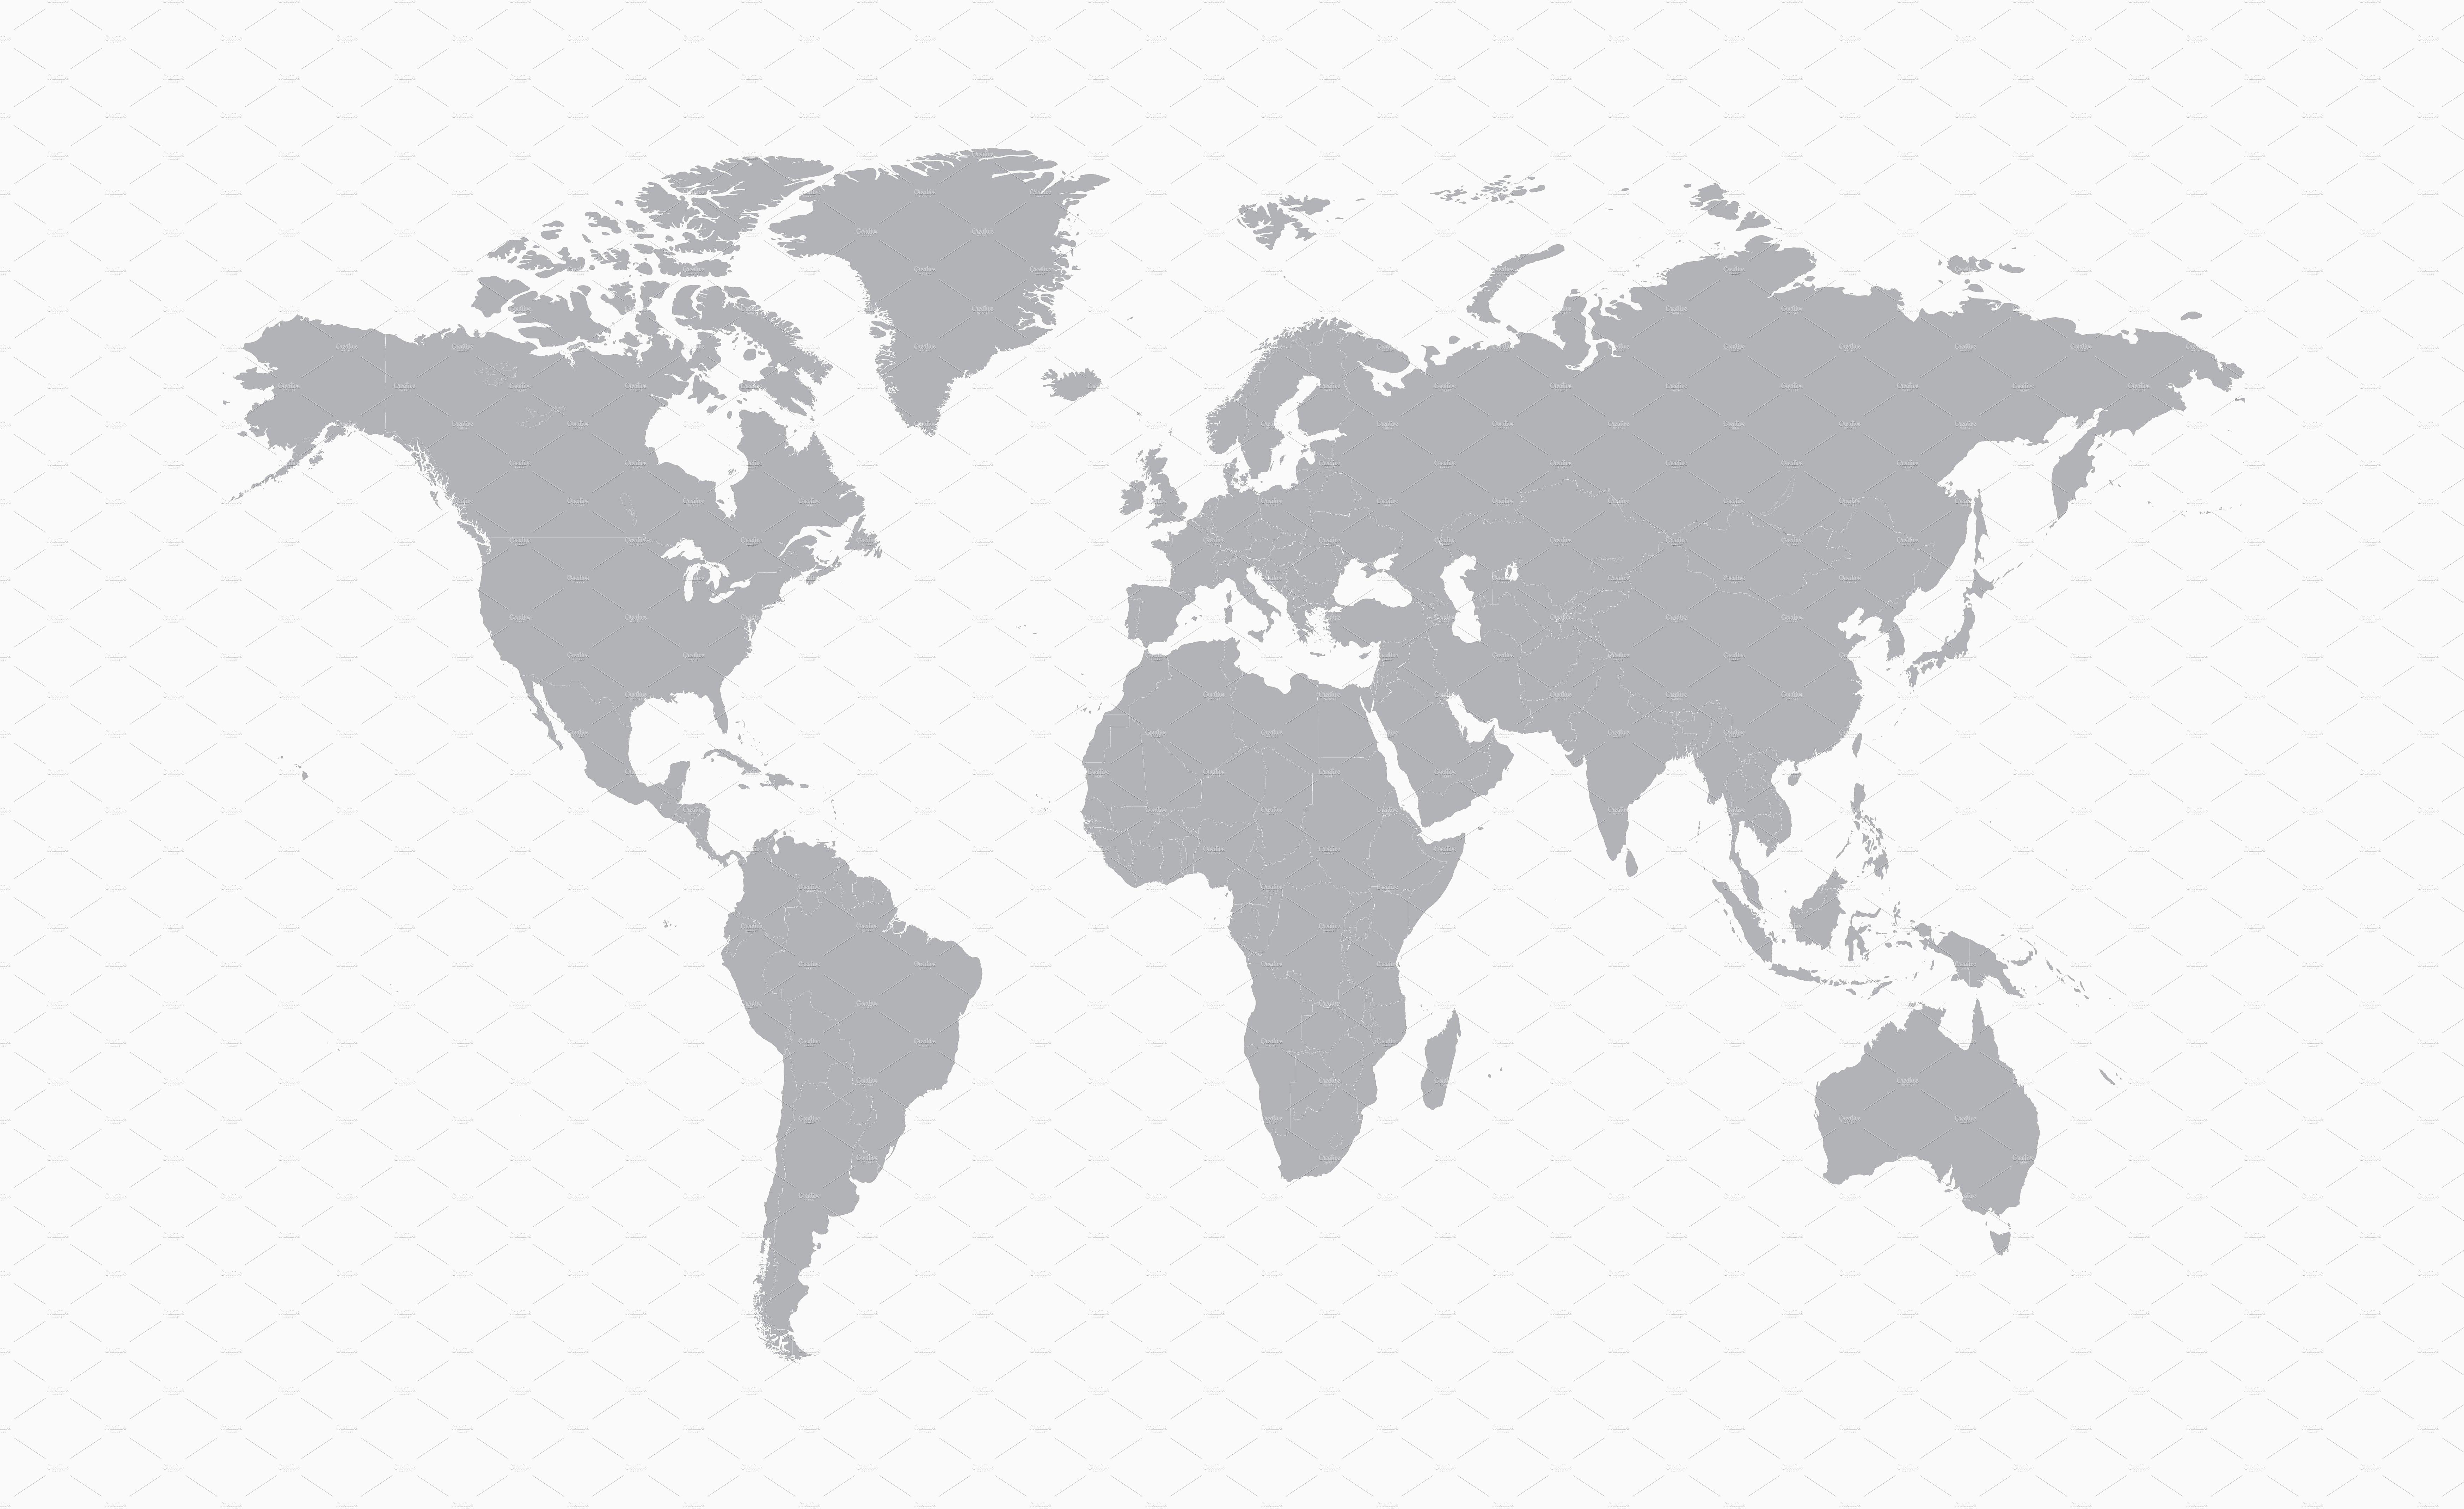 6990x4281 World Map Vector Luxury World Map Vector Flat Web Elements